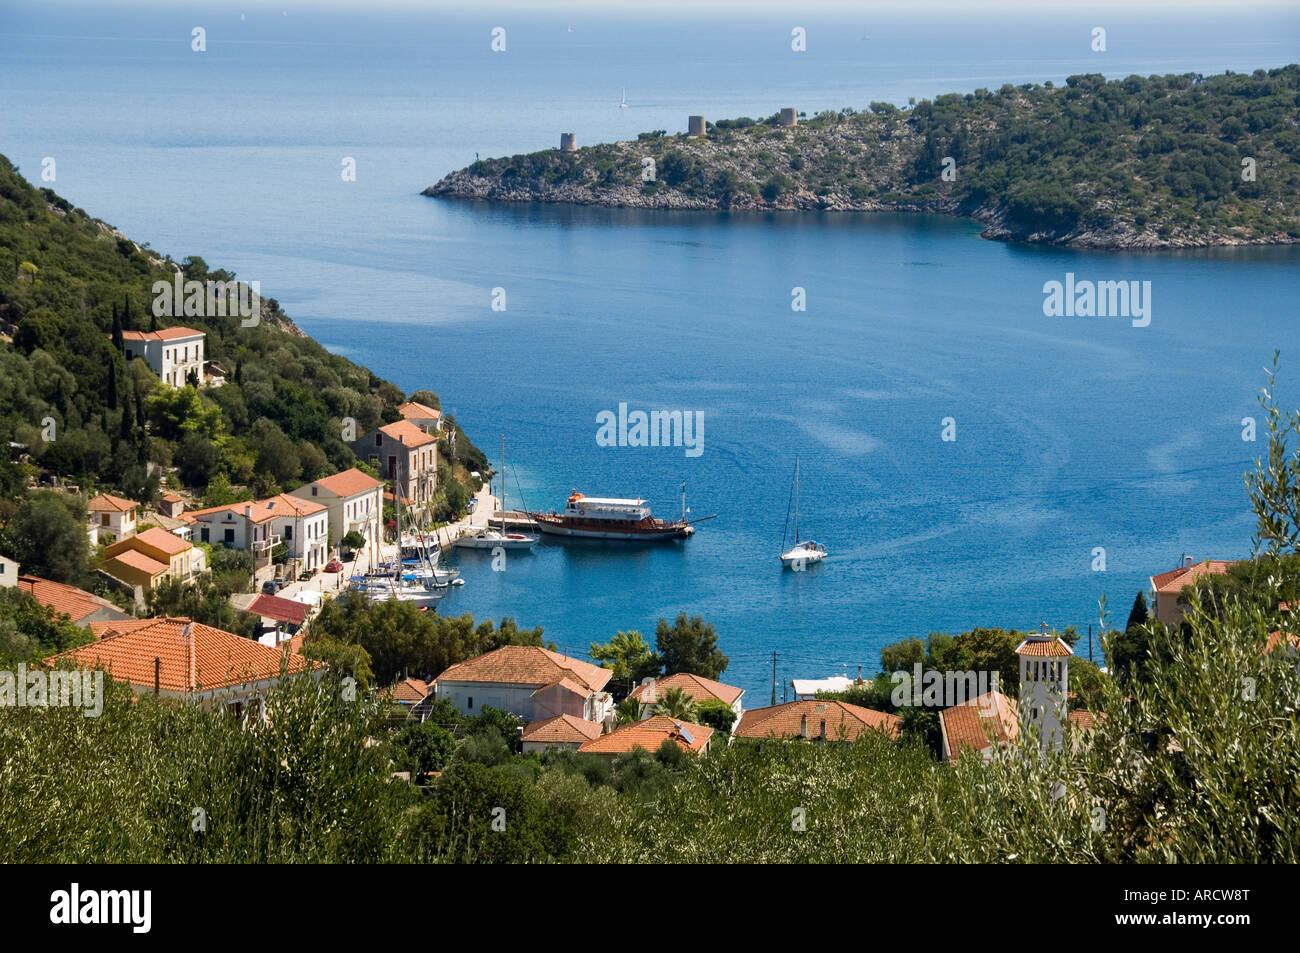 Kuoni, Ithaca, Ionian Islands, Greece, Europe Stock Photo